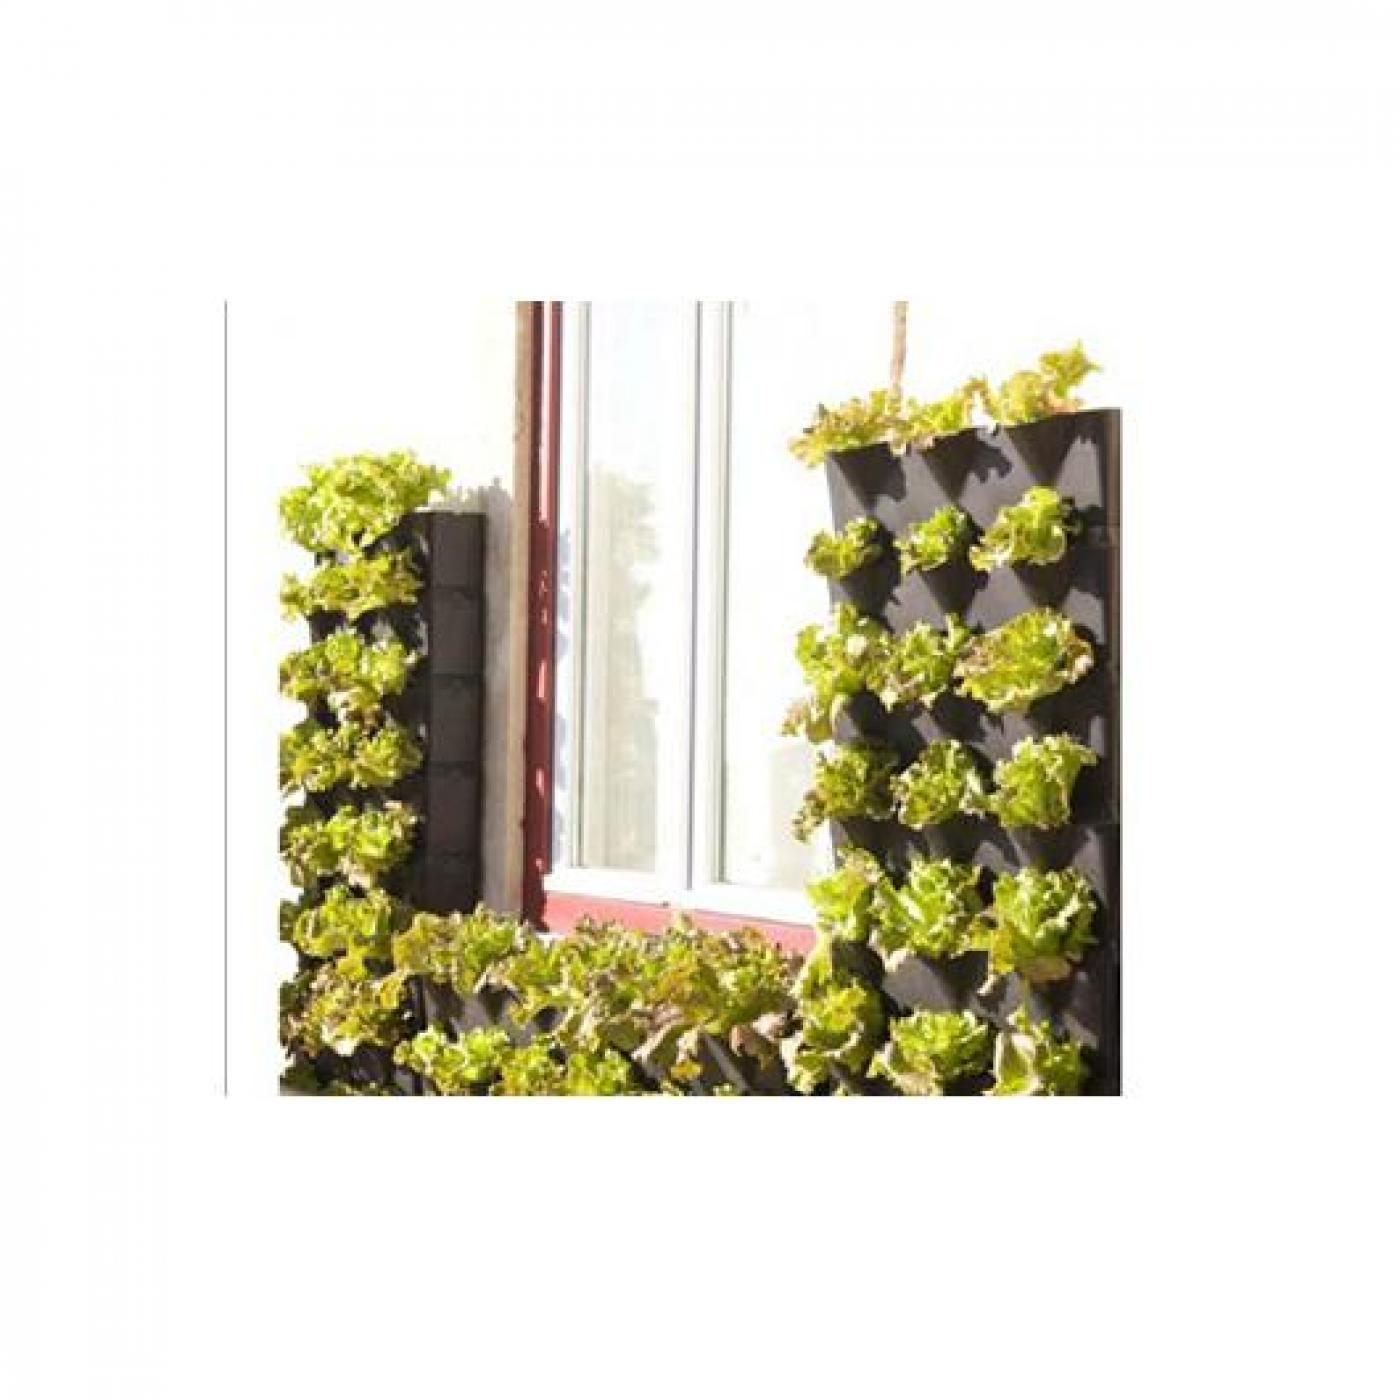 jardim vertical venda:Jardim vertical minigarden preto por €51,45 em Planeta Huerto